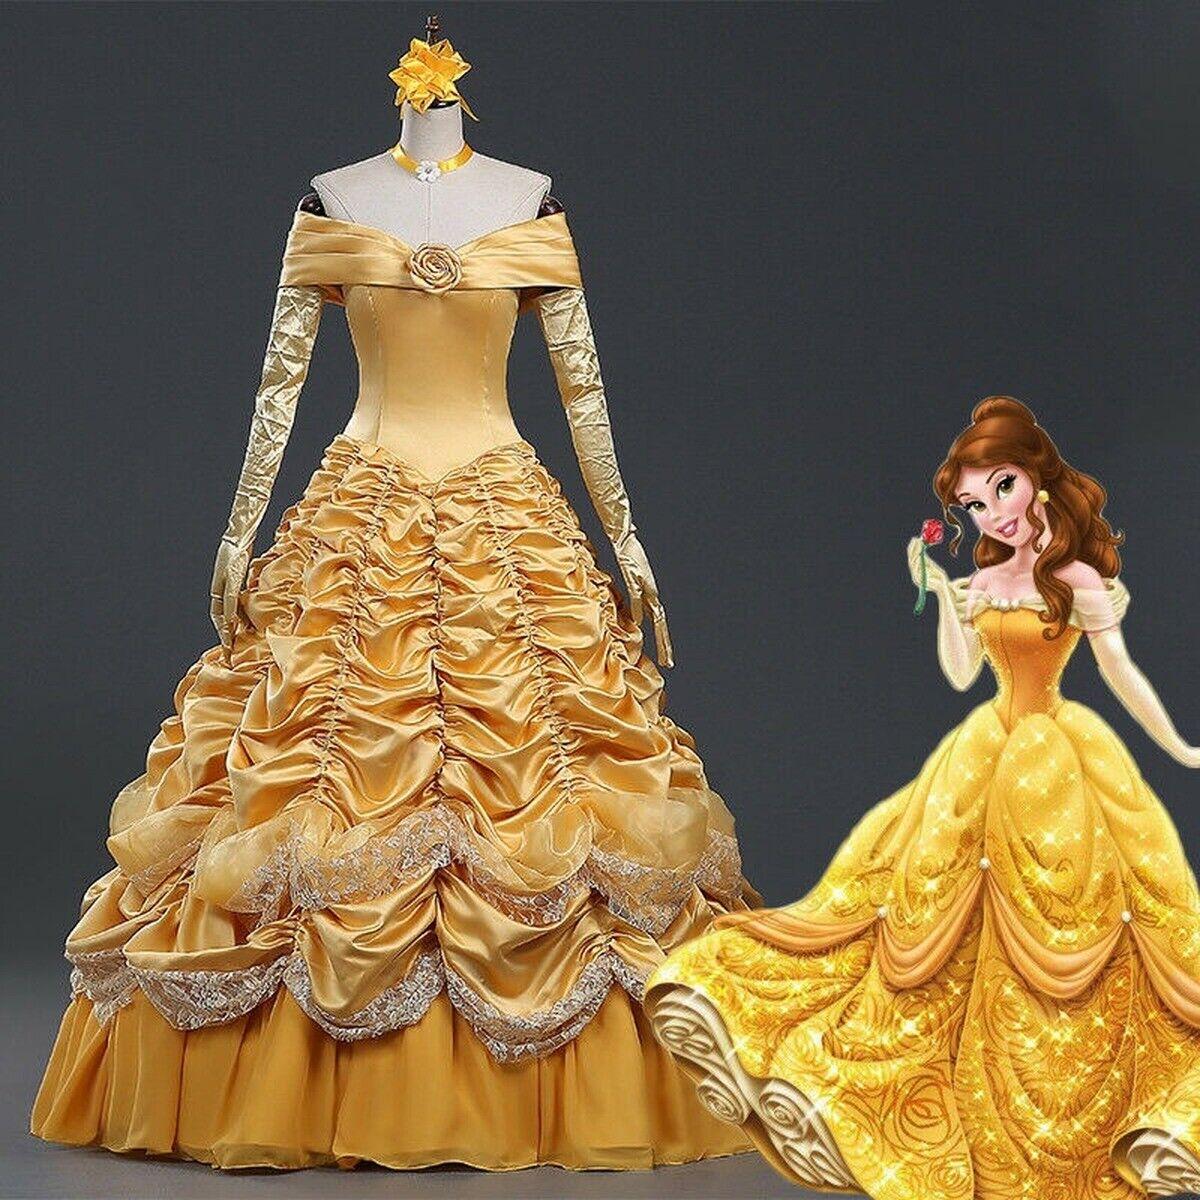 BRAND NEW AND UNWORN Disney Beauty /& the Beast - Princess Belle Dress 2018